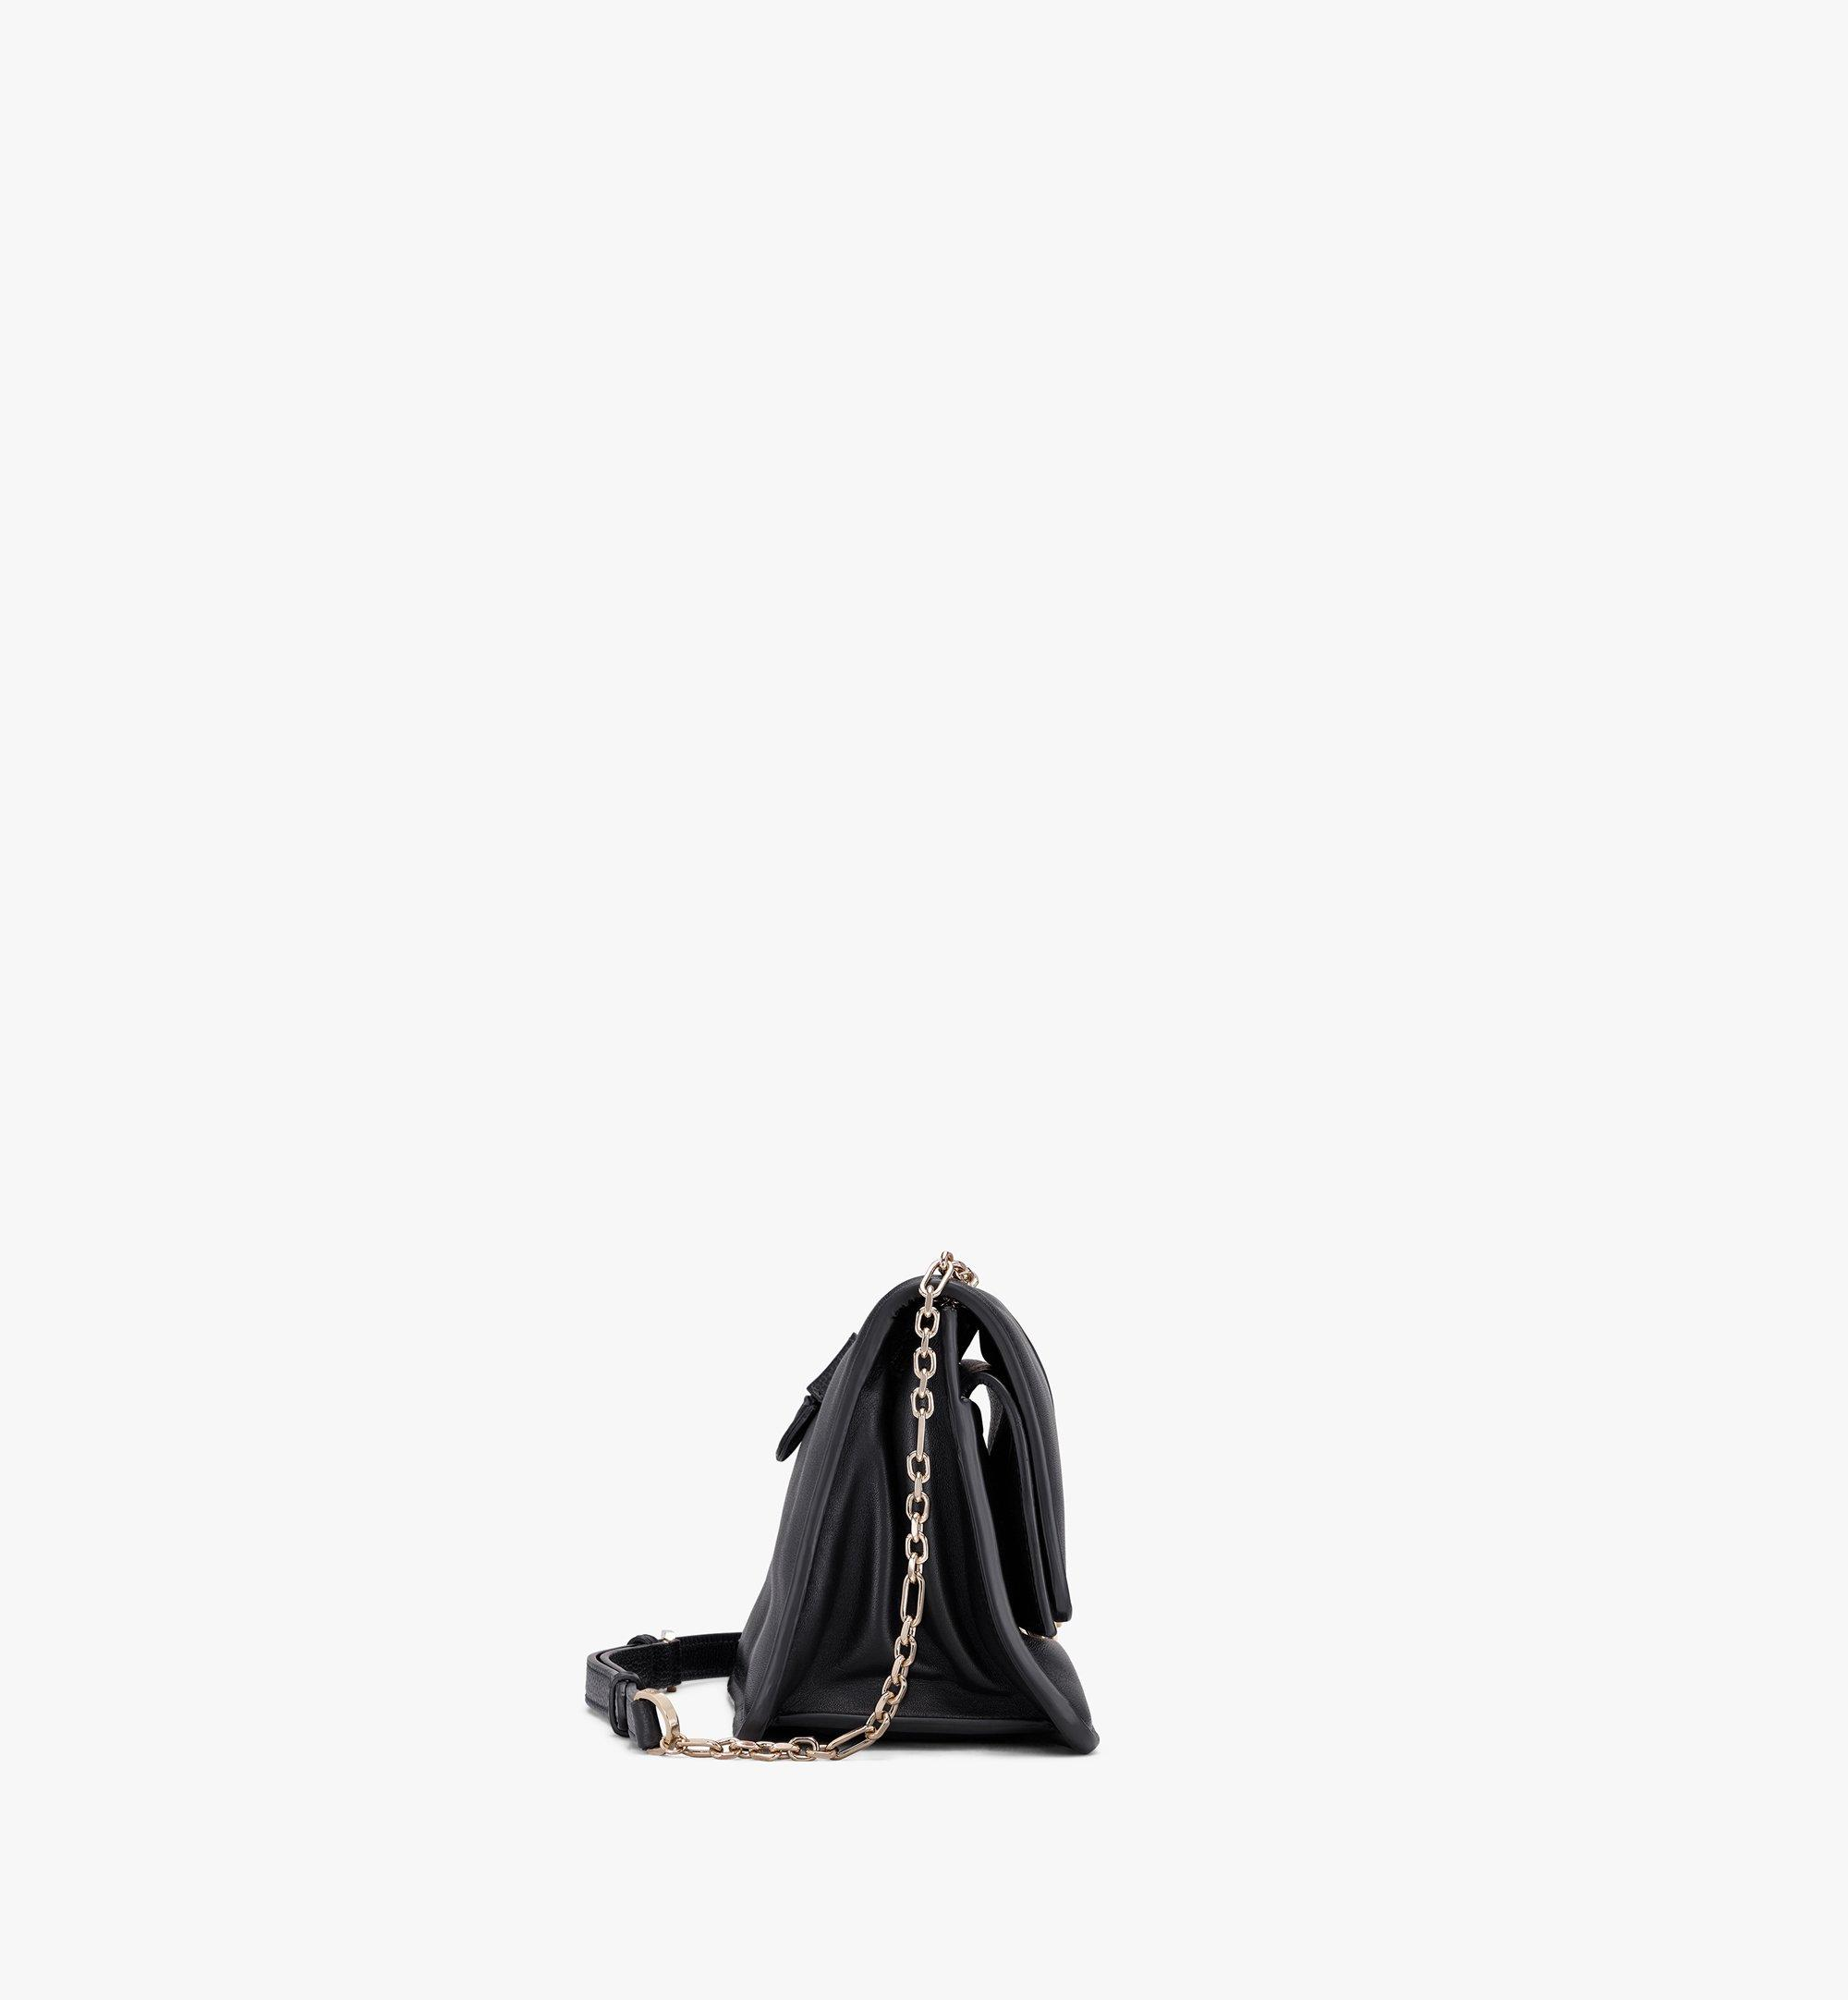 MCM Candy Shoulder Bag in Nappa Leather Black MWSASCY05BK001 Alternate View 2